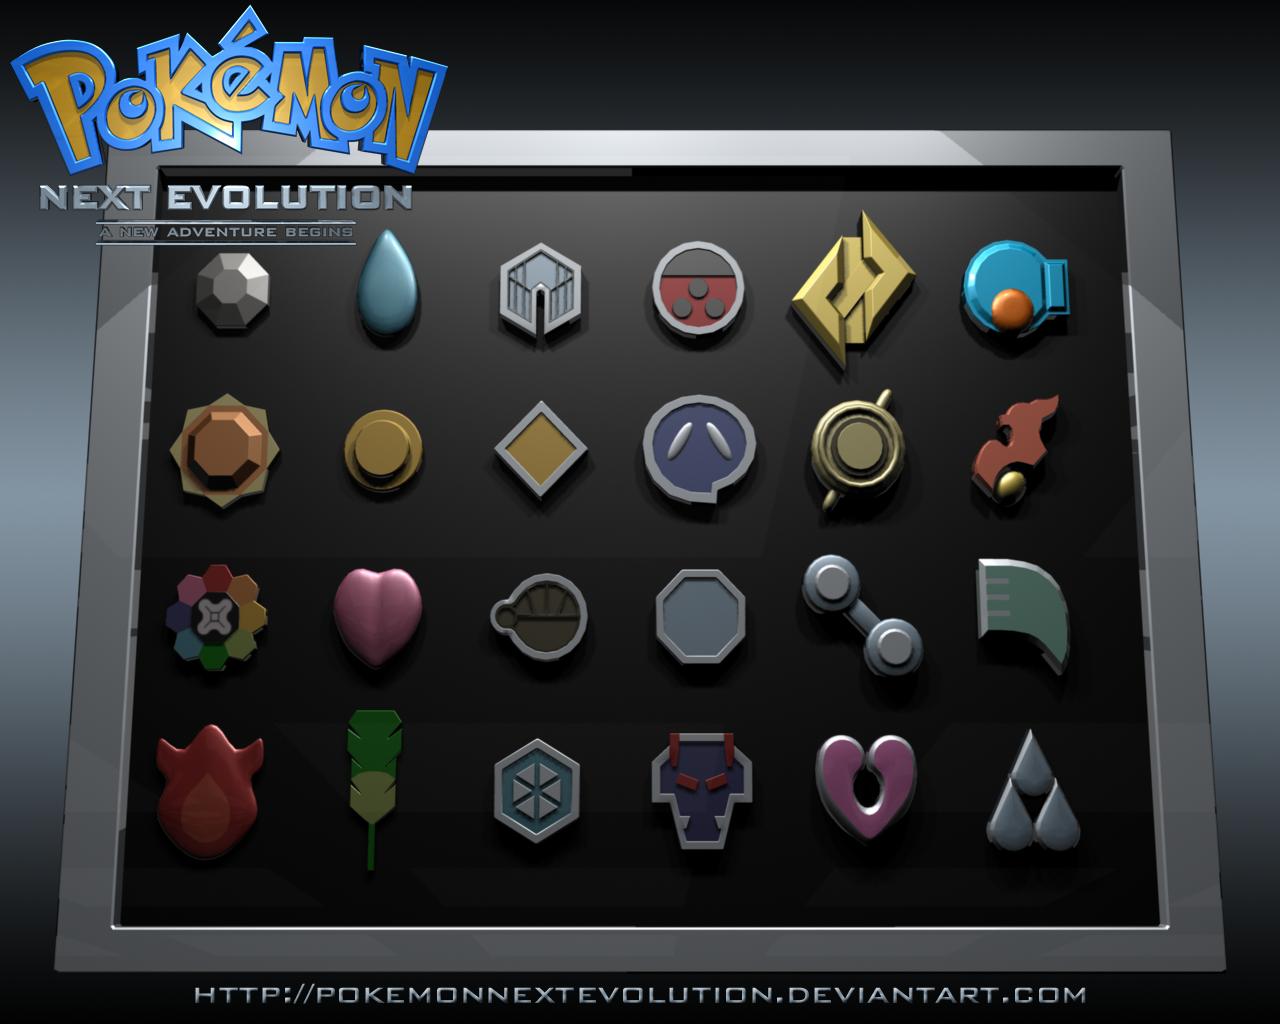 pokemon badges by PokemonNextEvolution on DeviantArt